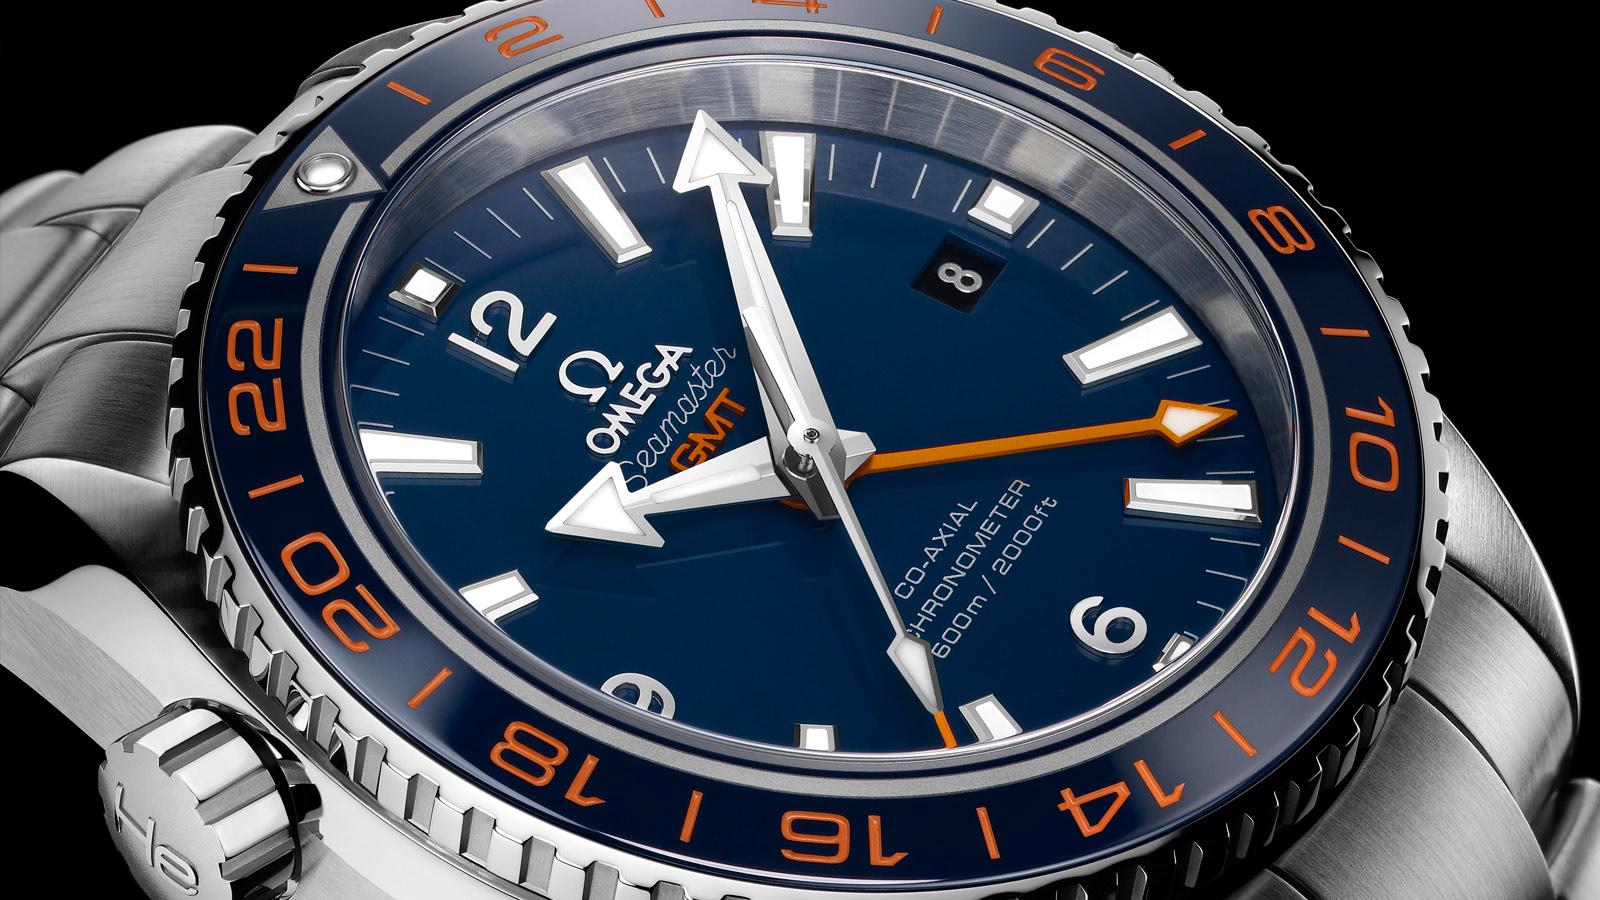 Seamaster 海洋宇宙600米腕表 海洋宇宙600米 欧米茄43.5毫米同轴GMT腕表 - 232.30.44.22.03.001 - 查看 1